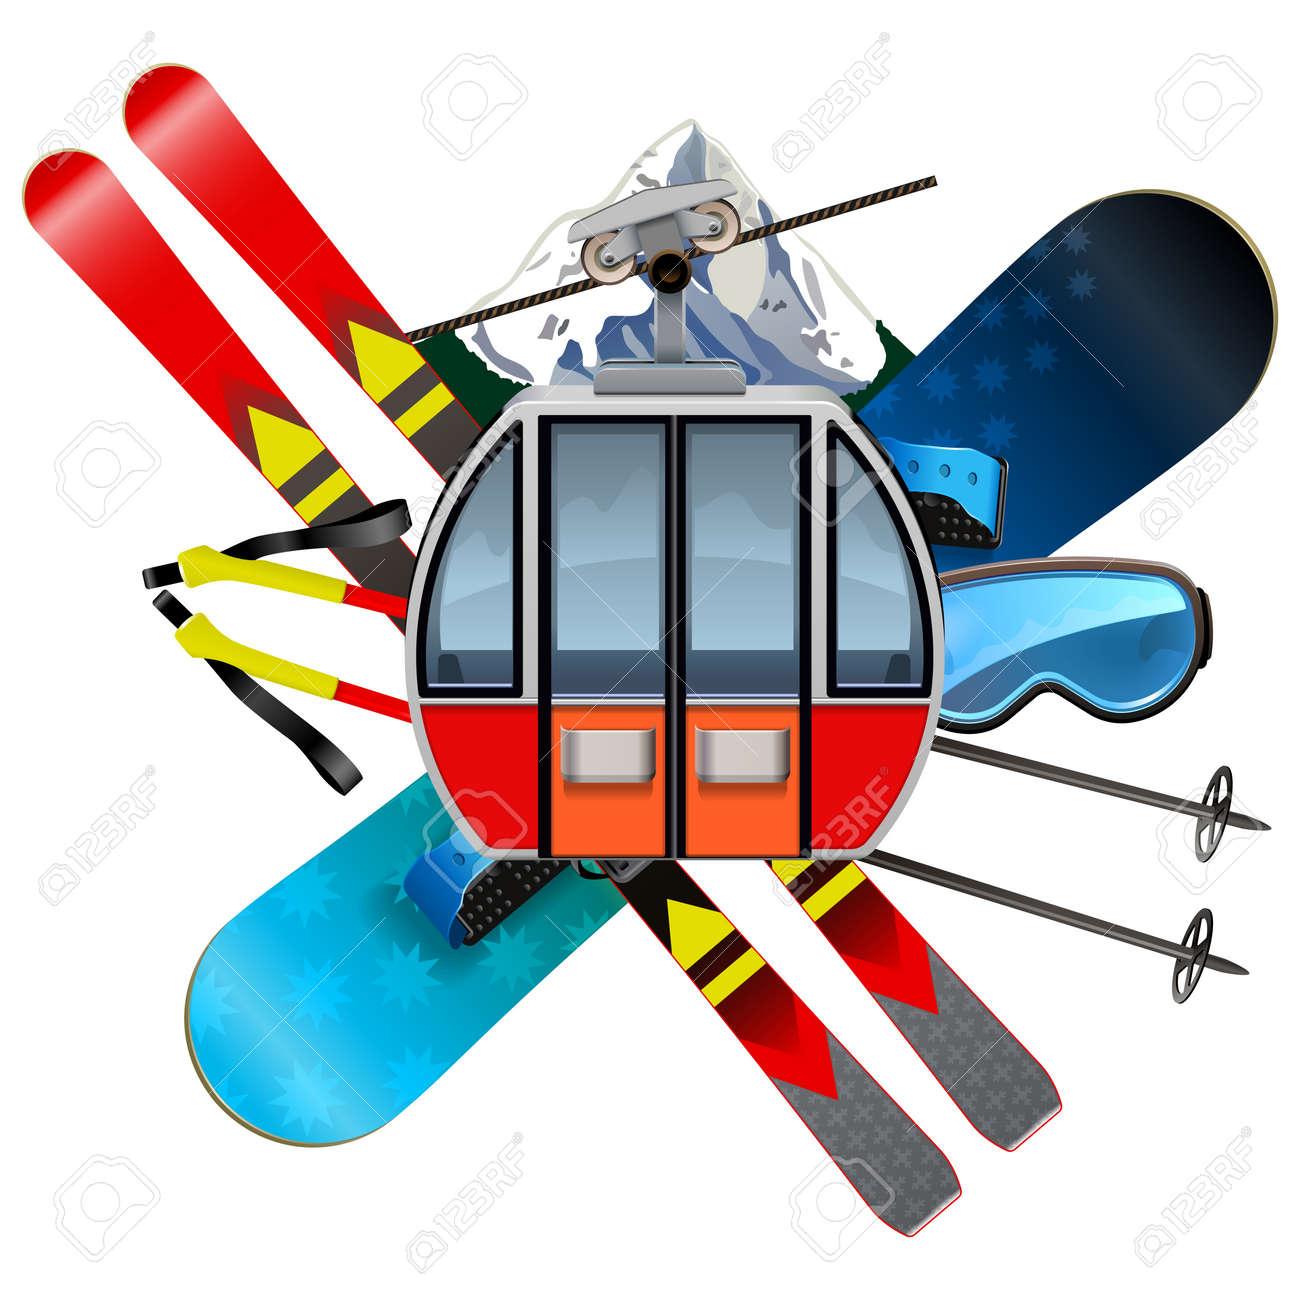 Vector Ski Resort Concept isolated on white background - 155857682